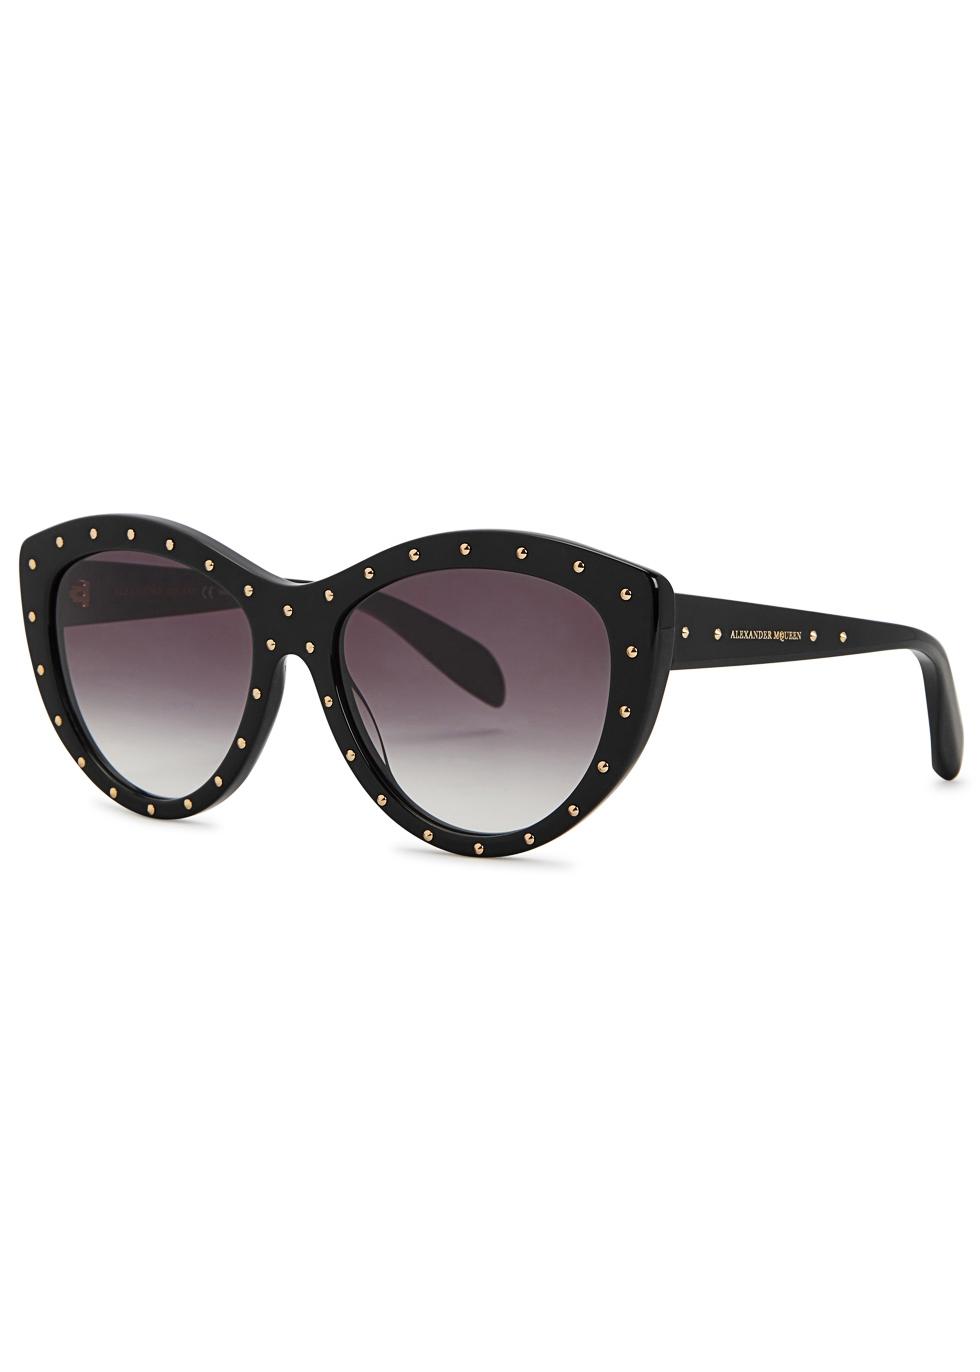 Black studded cat-eye sunglasses - Alexander McQueen